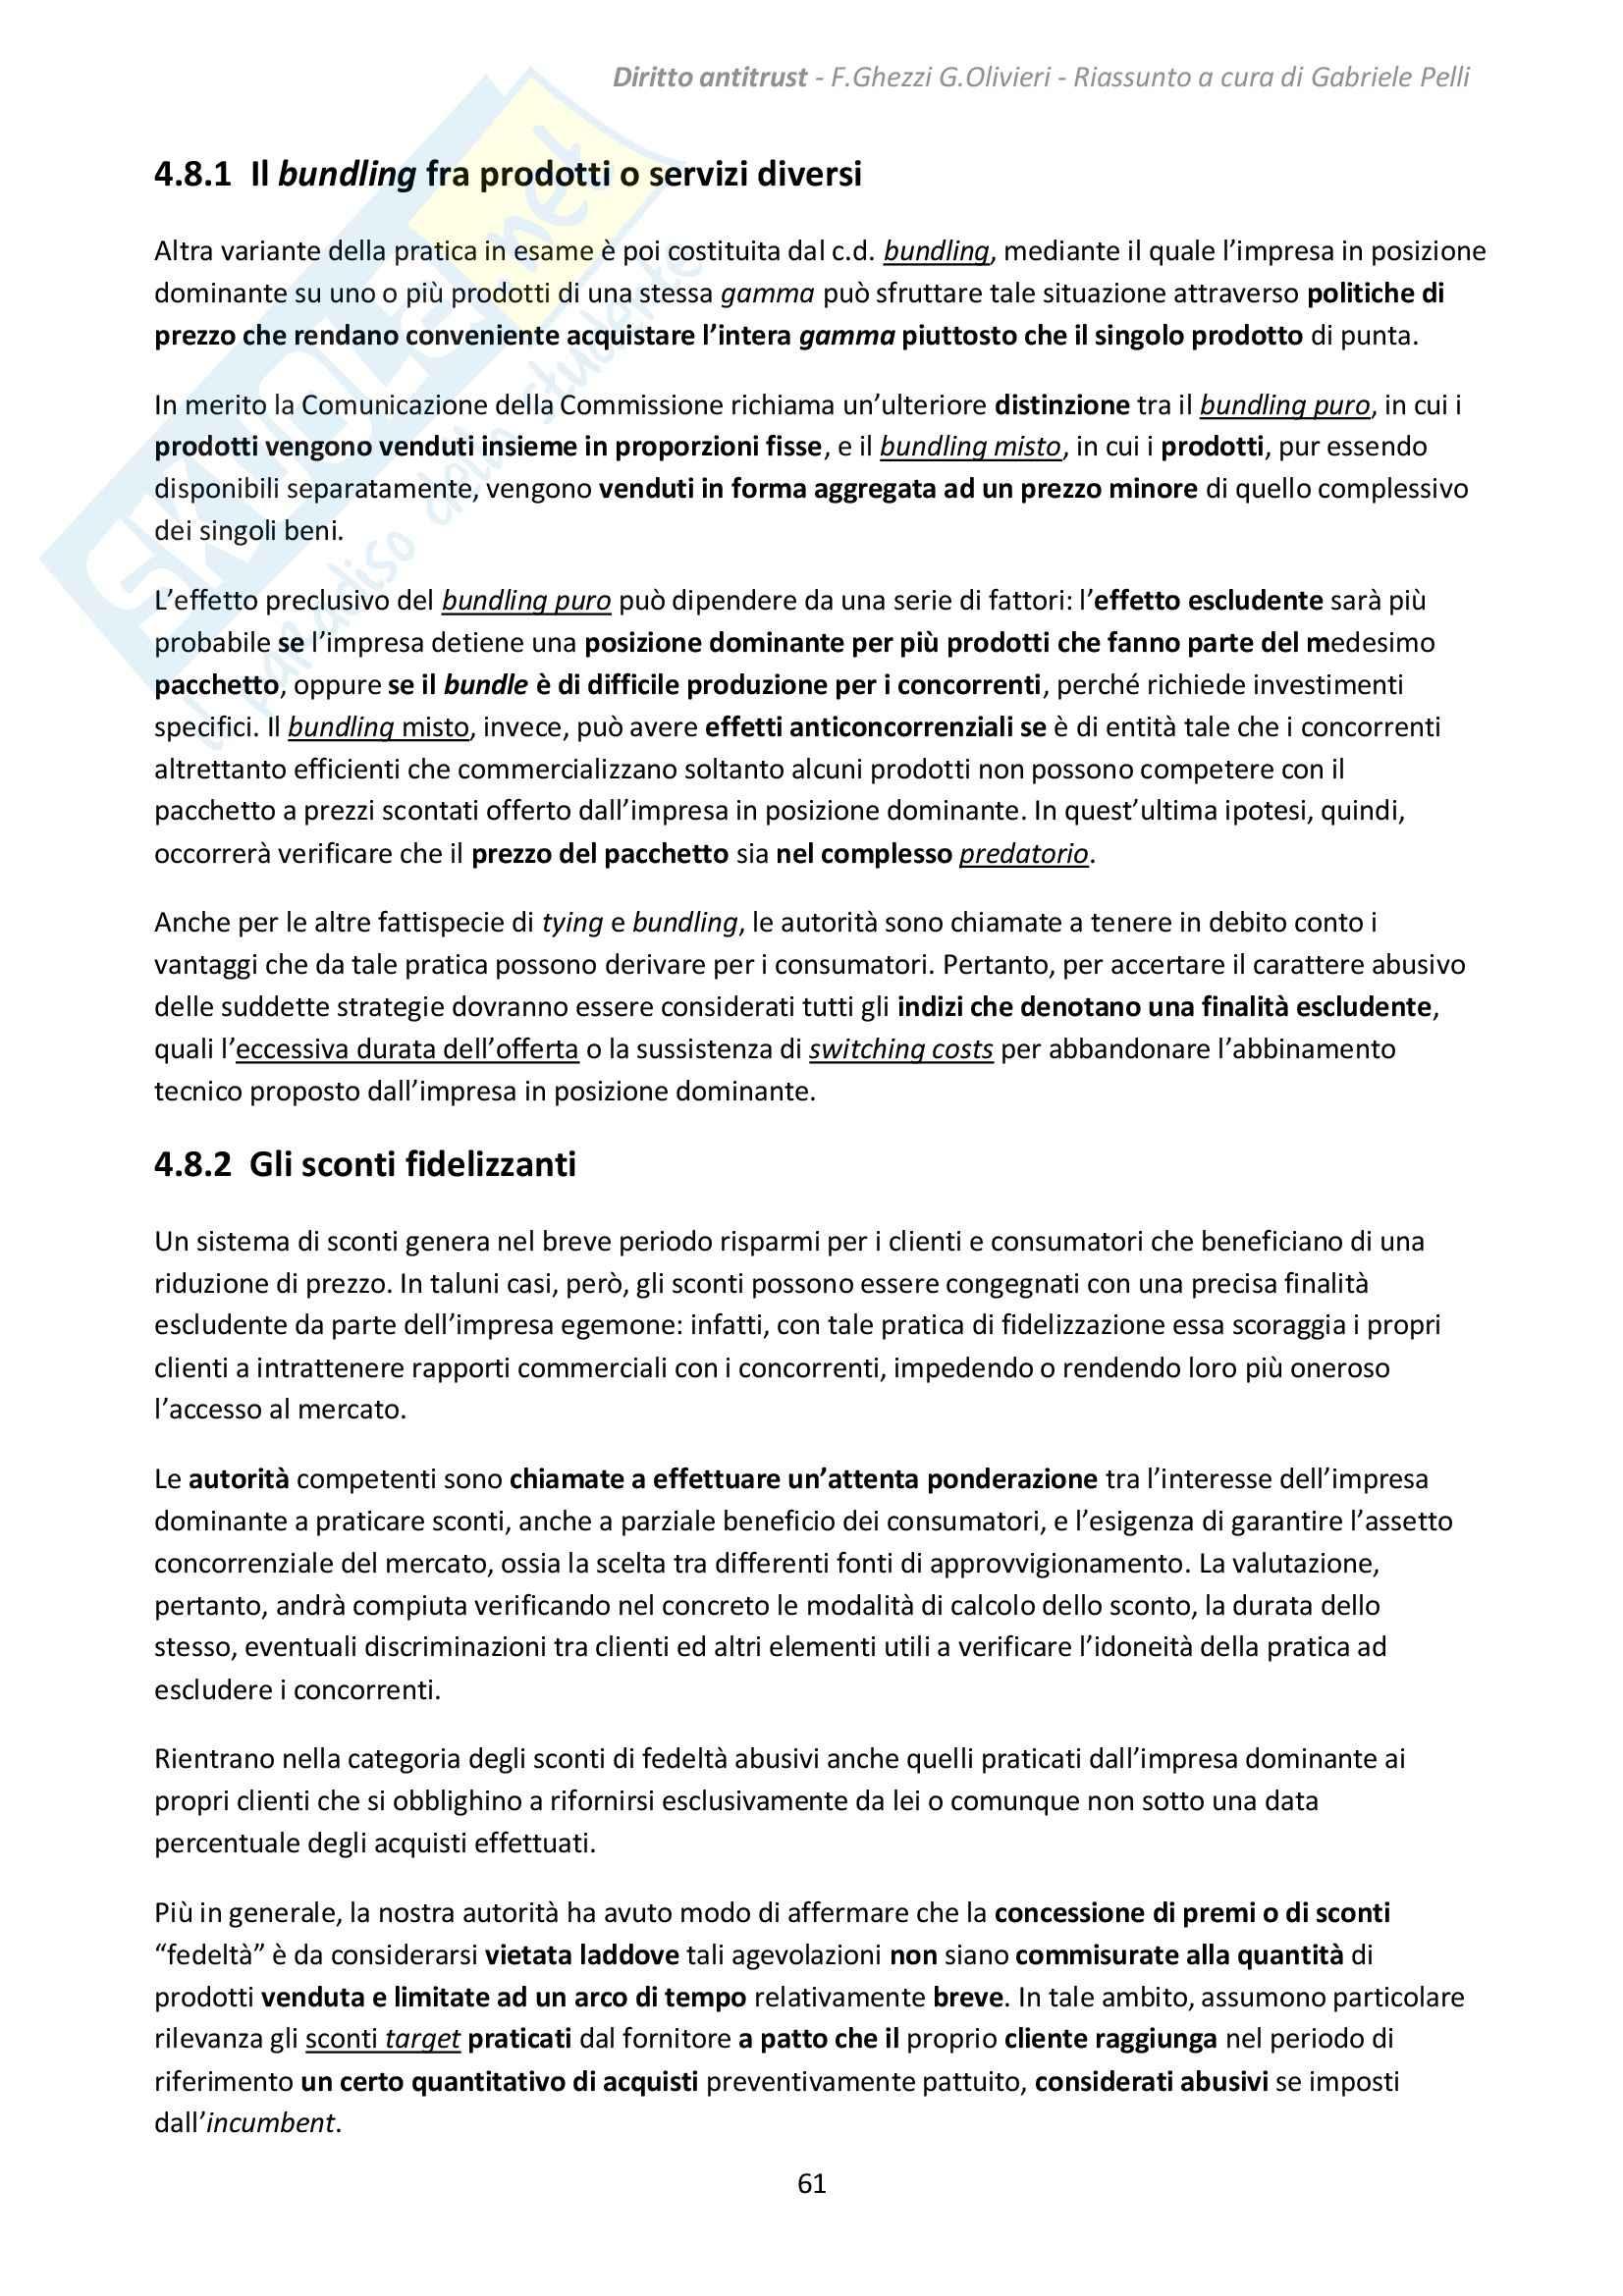 Riassunto esame Diritto antitrust, prof. Ghezzi, libro consigliato Diritto antitrust, Ghezzi, Olivieri Pag. 61